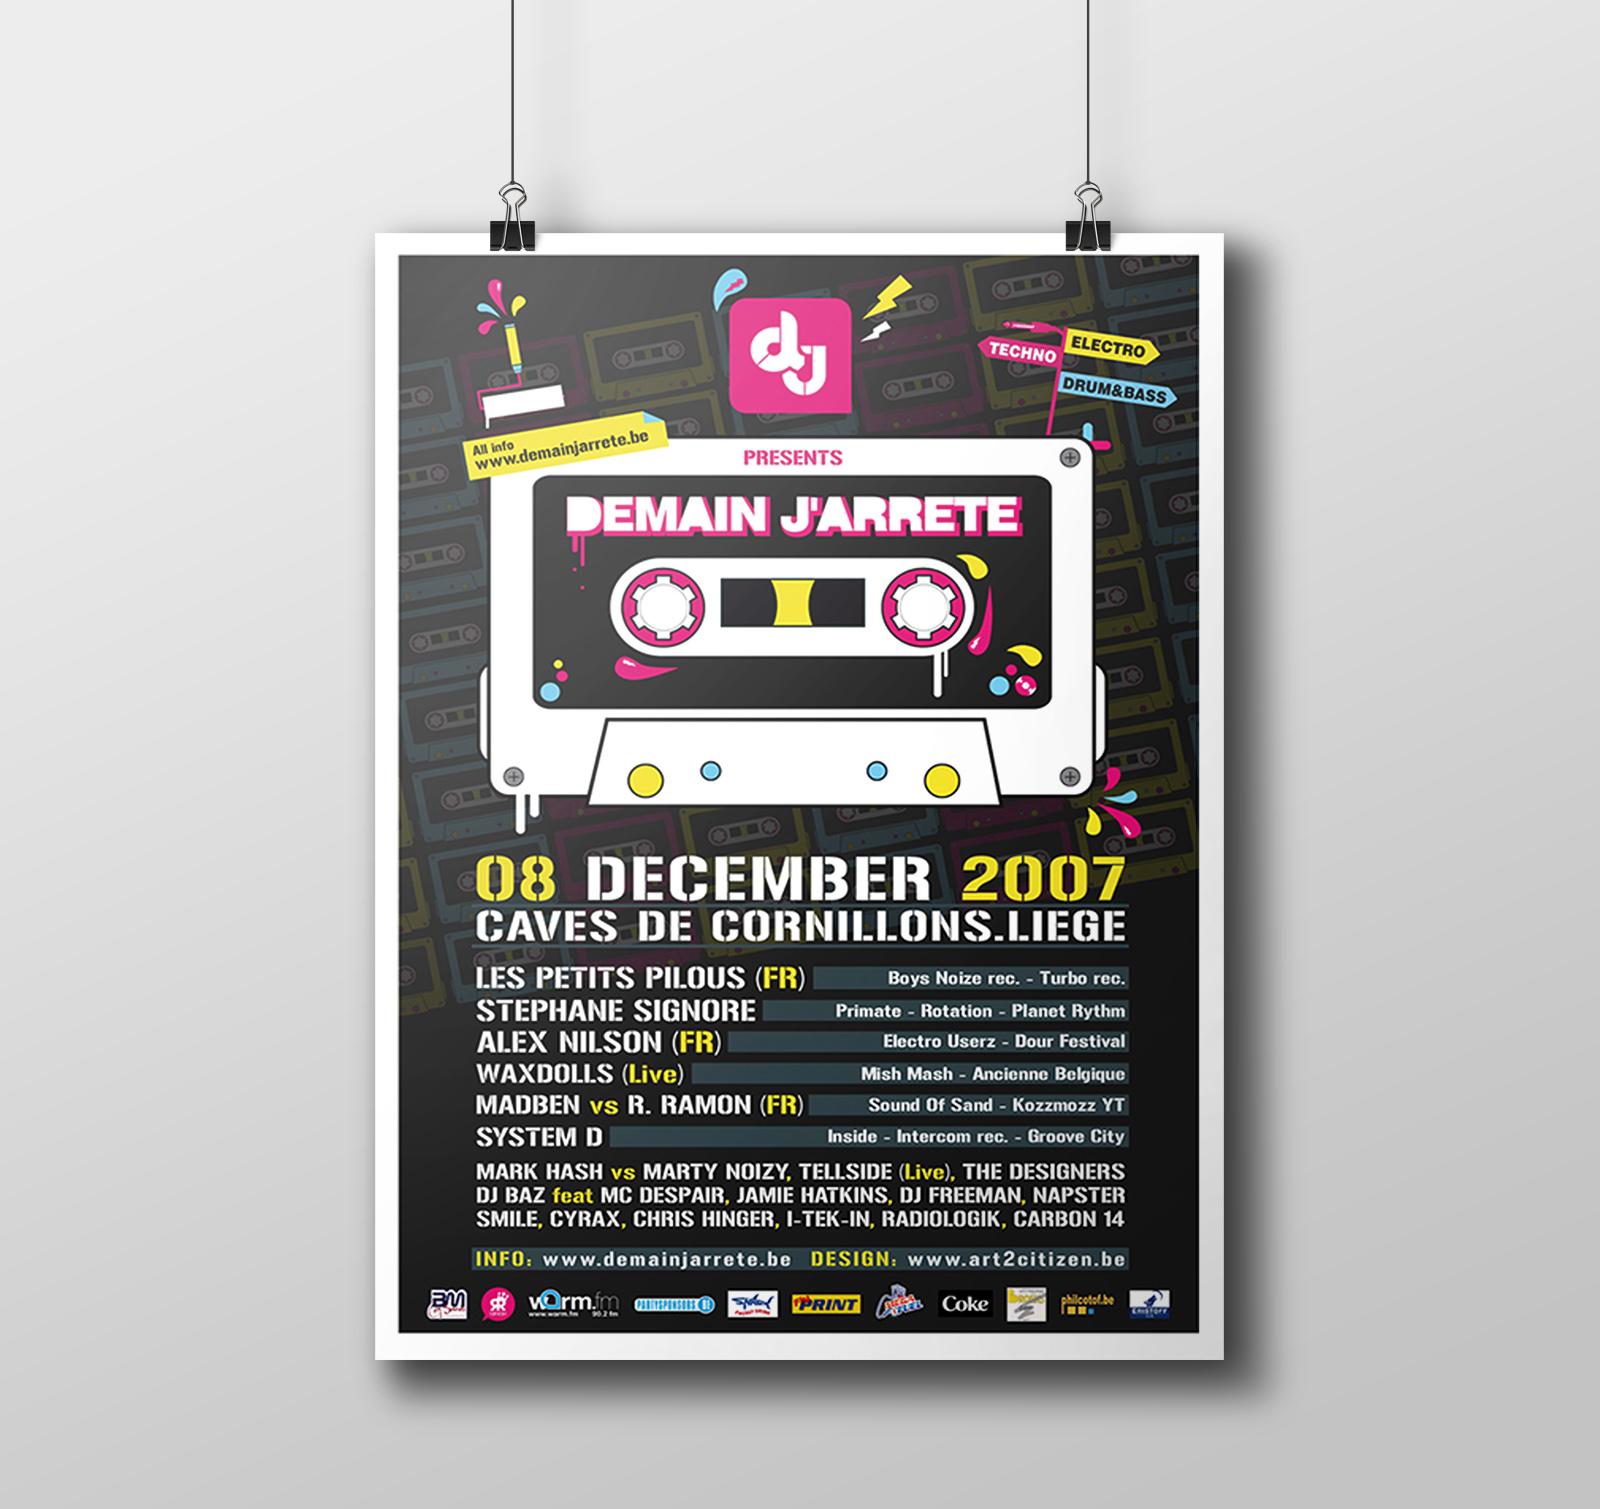 poster_mockup_MD2